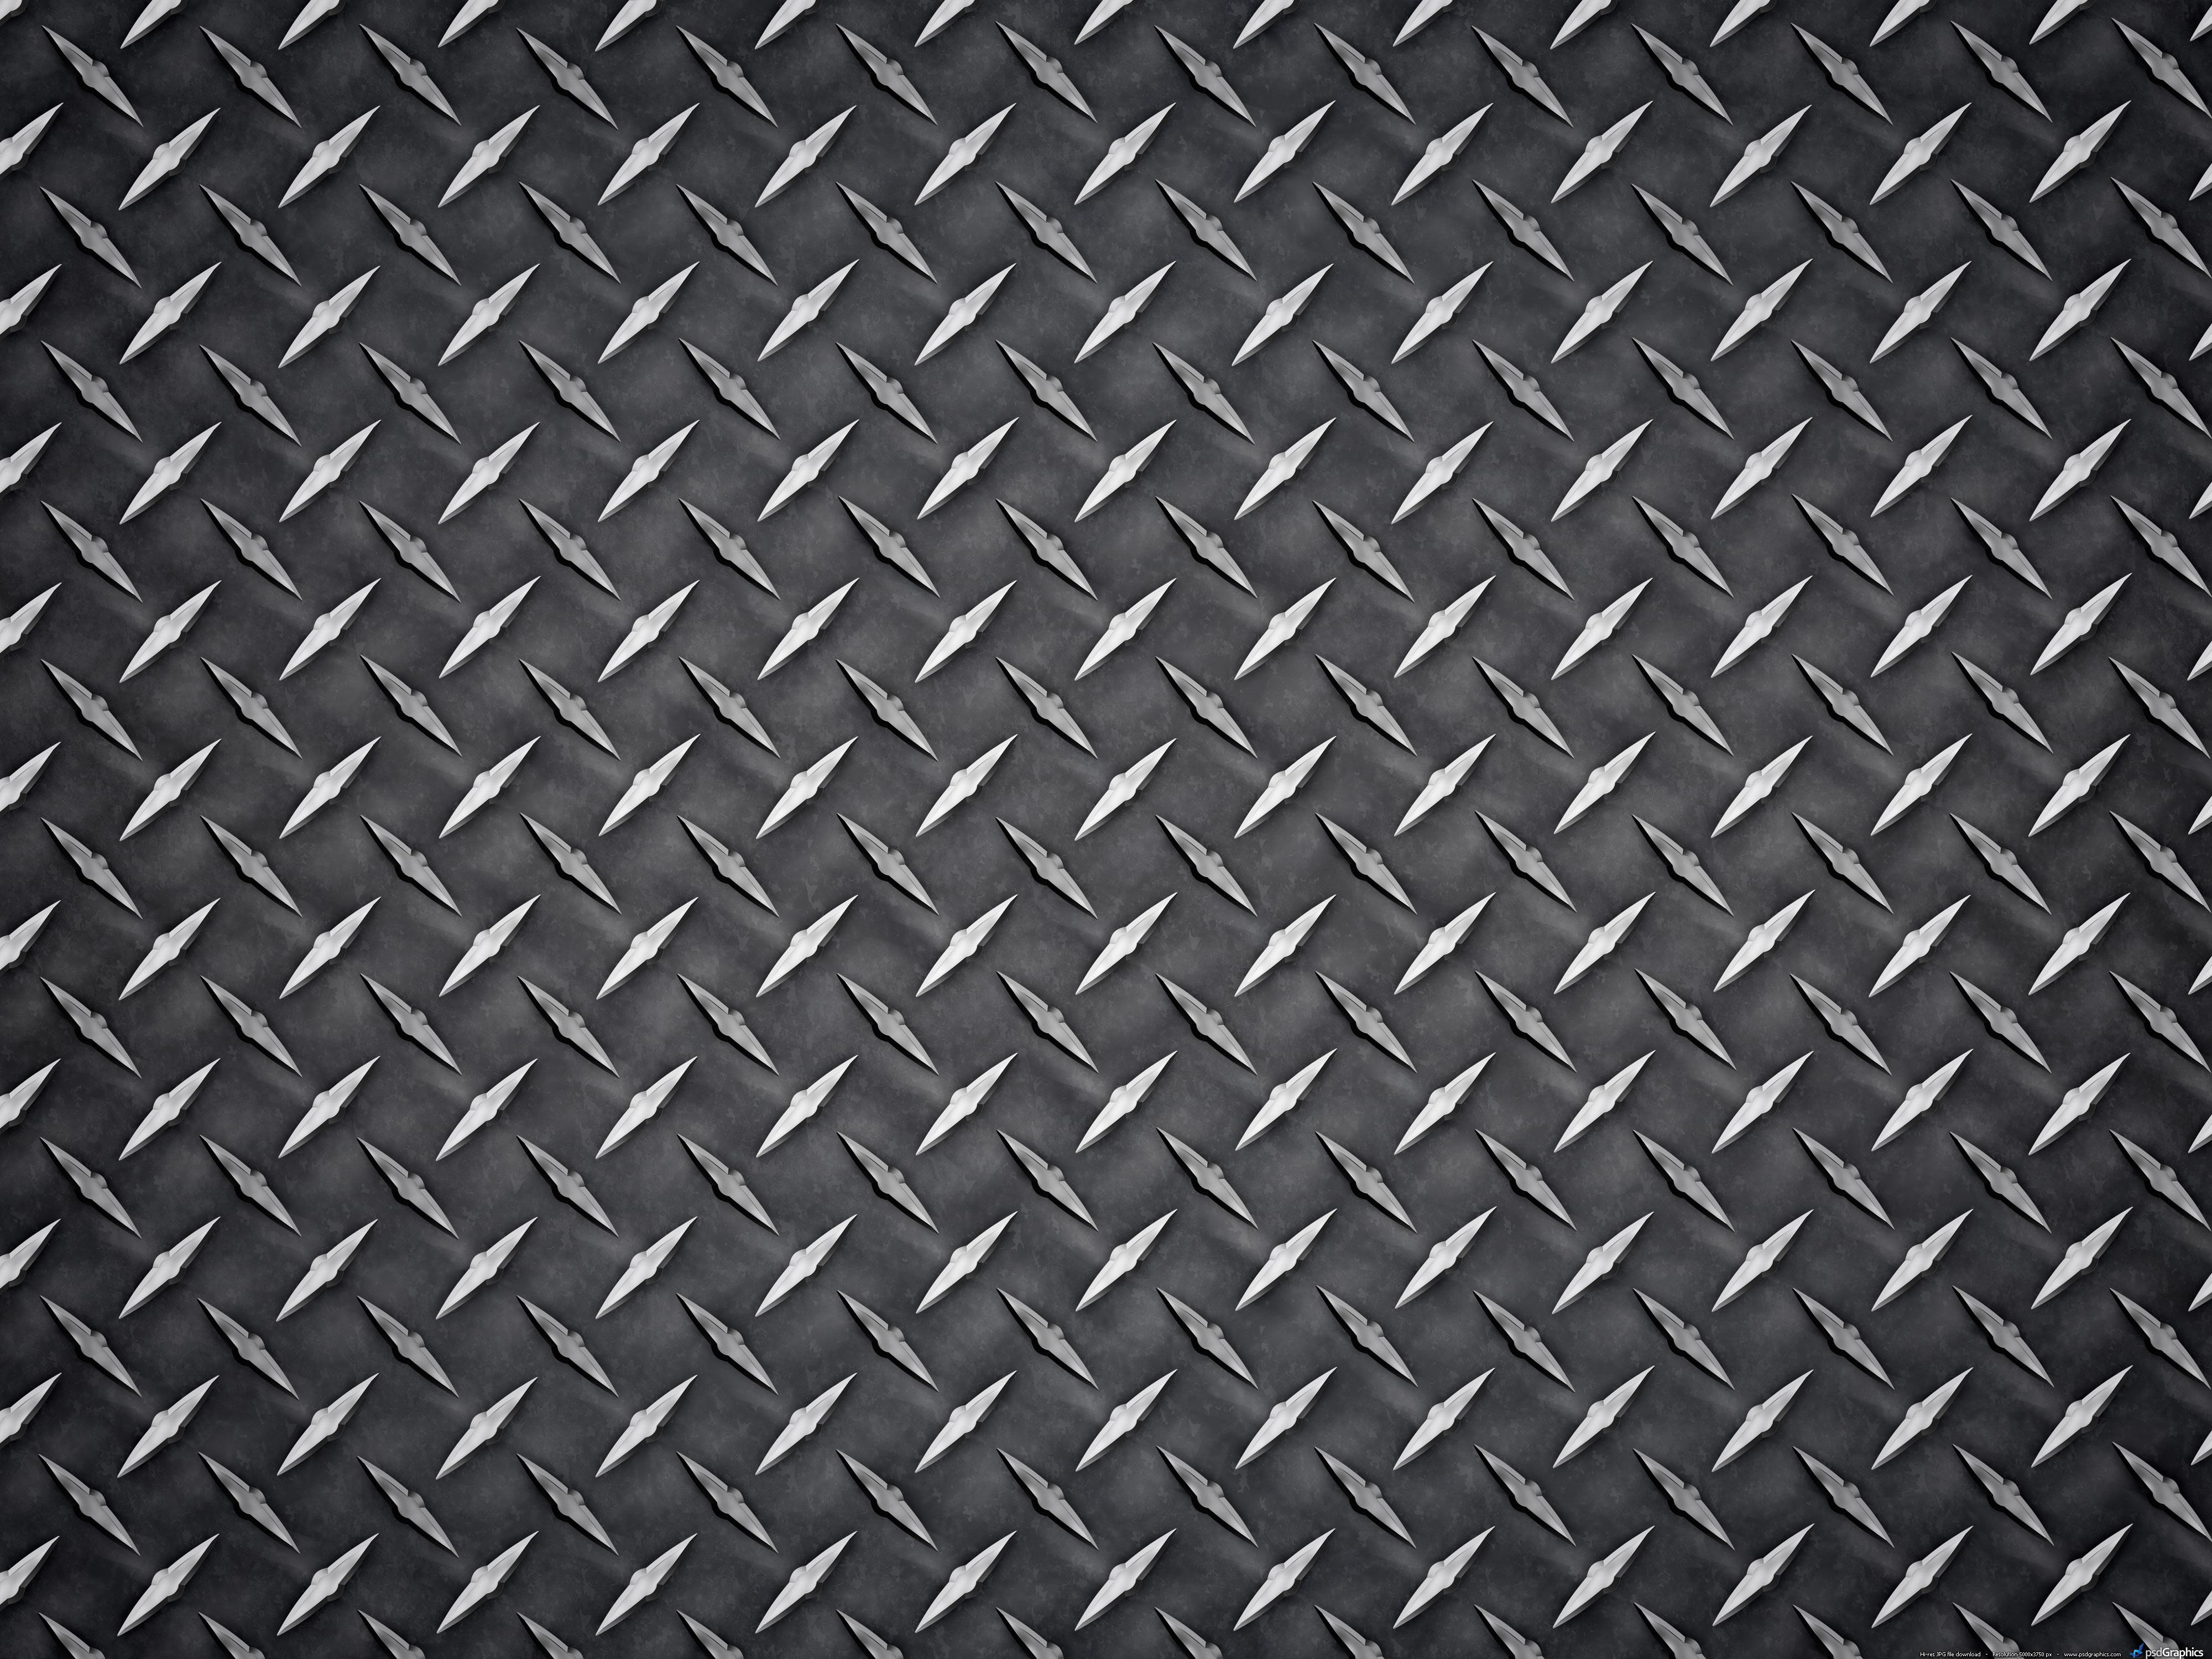 . PlusPng.com black-diamond-plate.jpg PlusPng.com  - Diamond Plate PNG HD